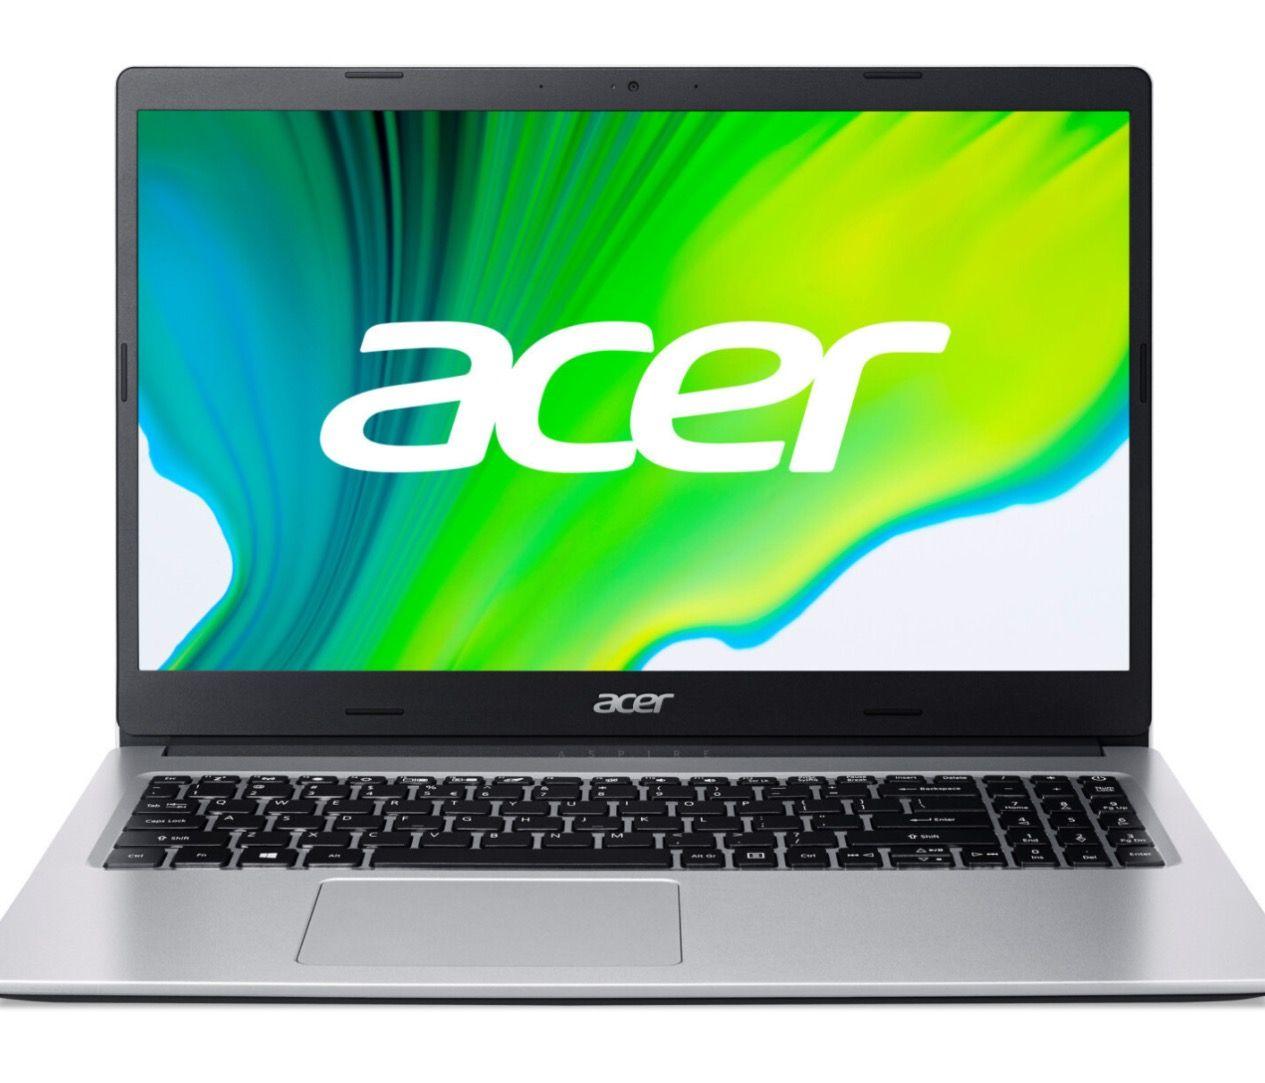 Acer Swift 1 (SF113 31 C3MA)   13,3 Full HD Notebook mit Windows 10 für 333€ (statt 392€)